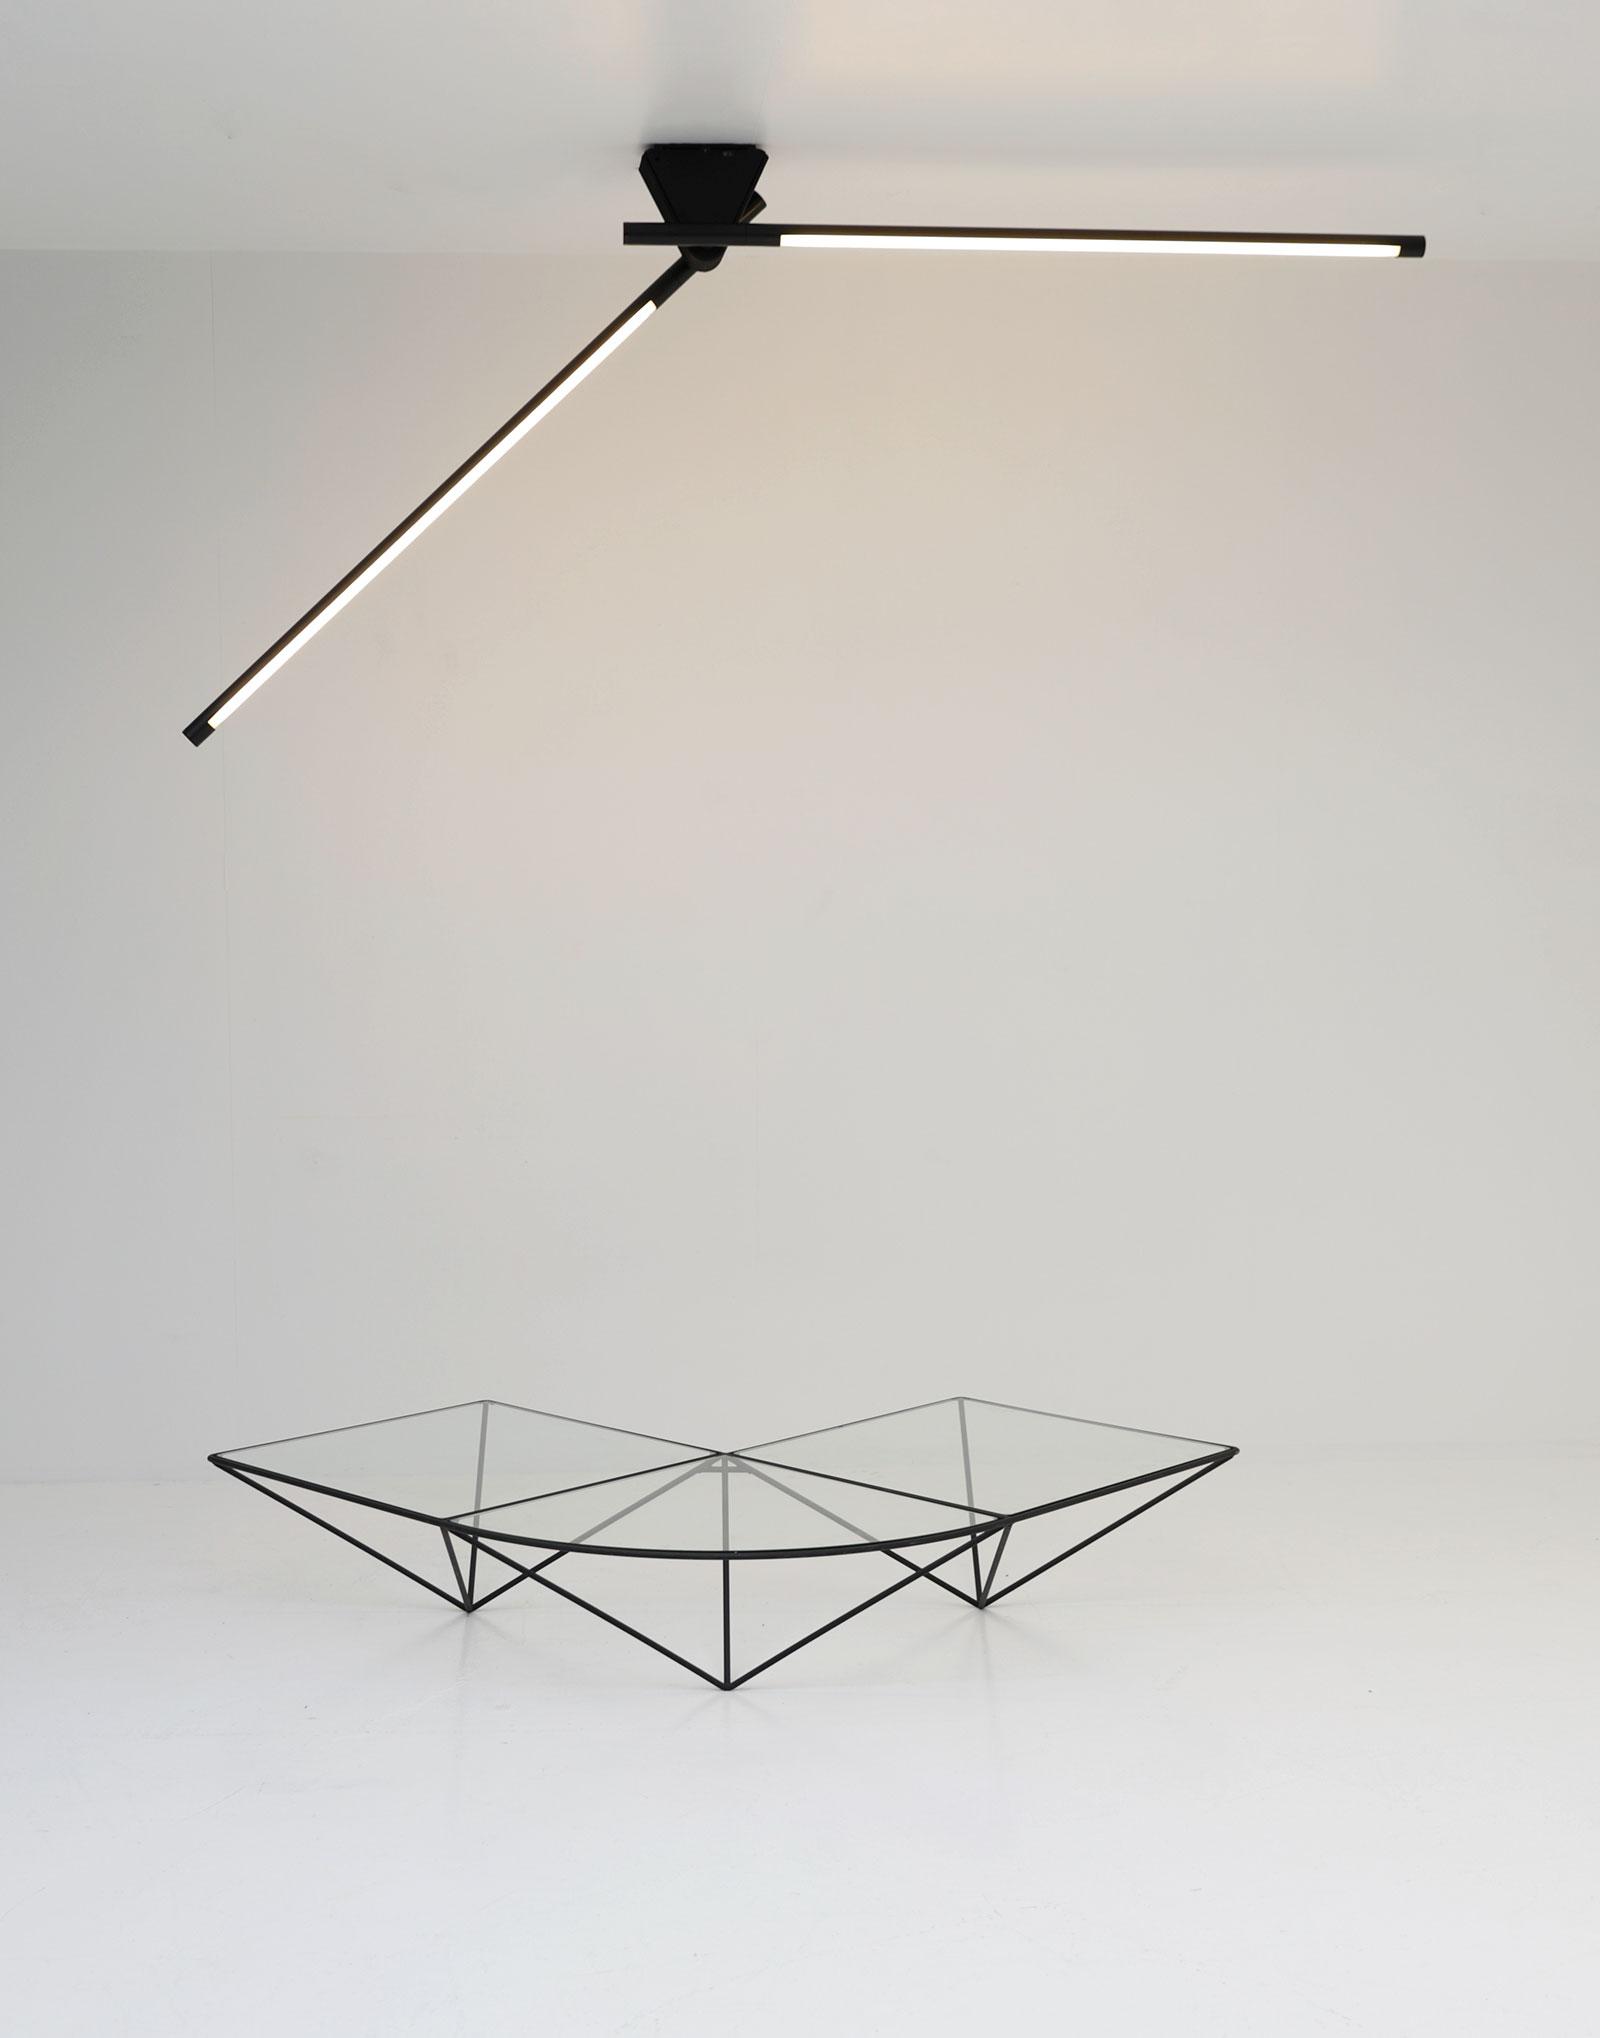 Rodolfo Bonetto Wall, Ceiling or Floor lampimage 12